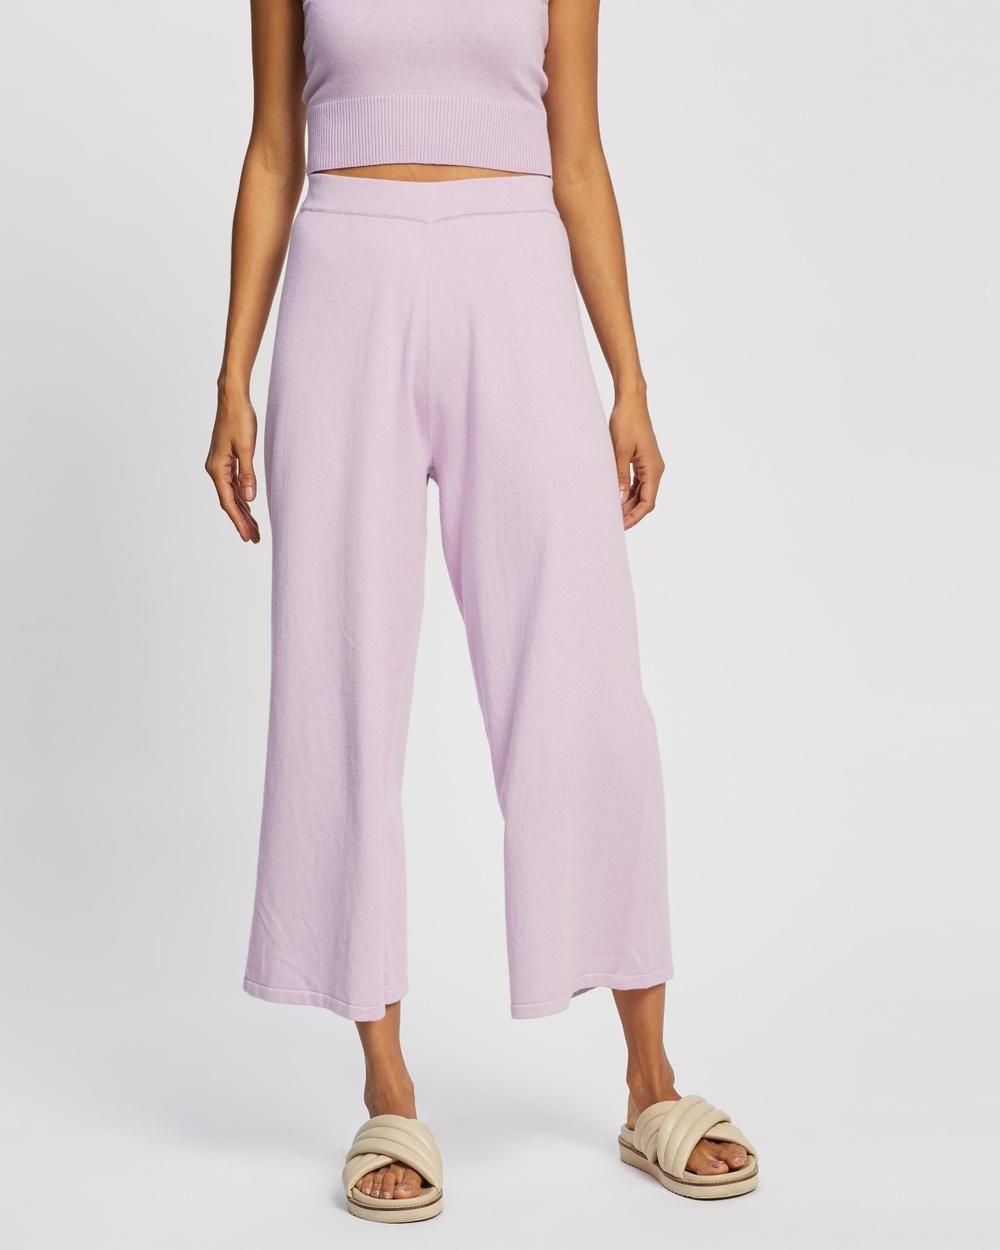 AERE Organic Cotton Knit Pants Pink Lavender